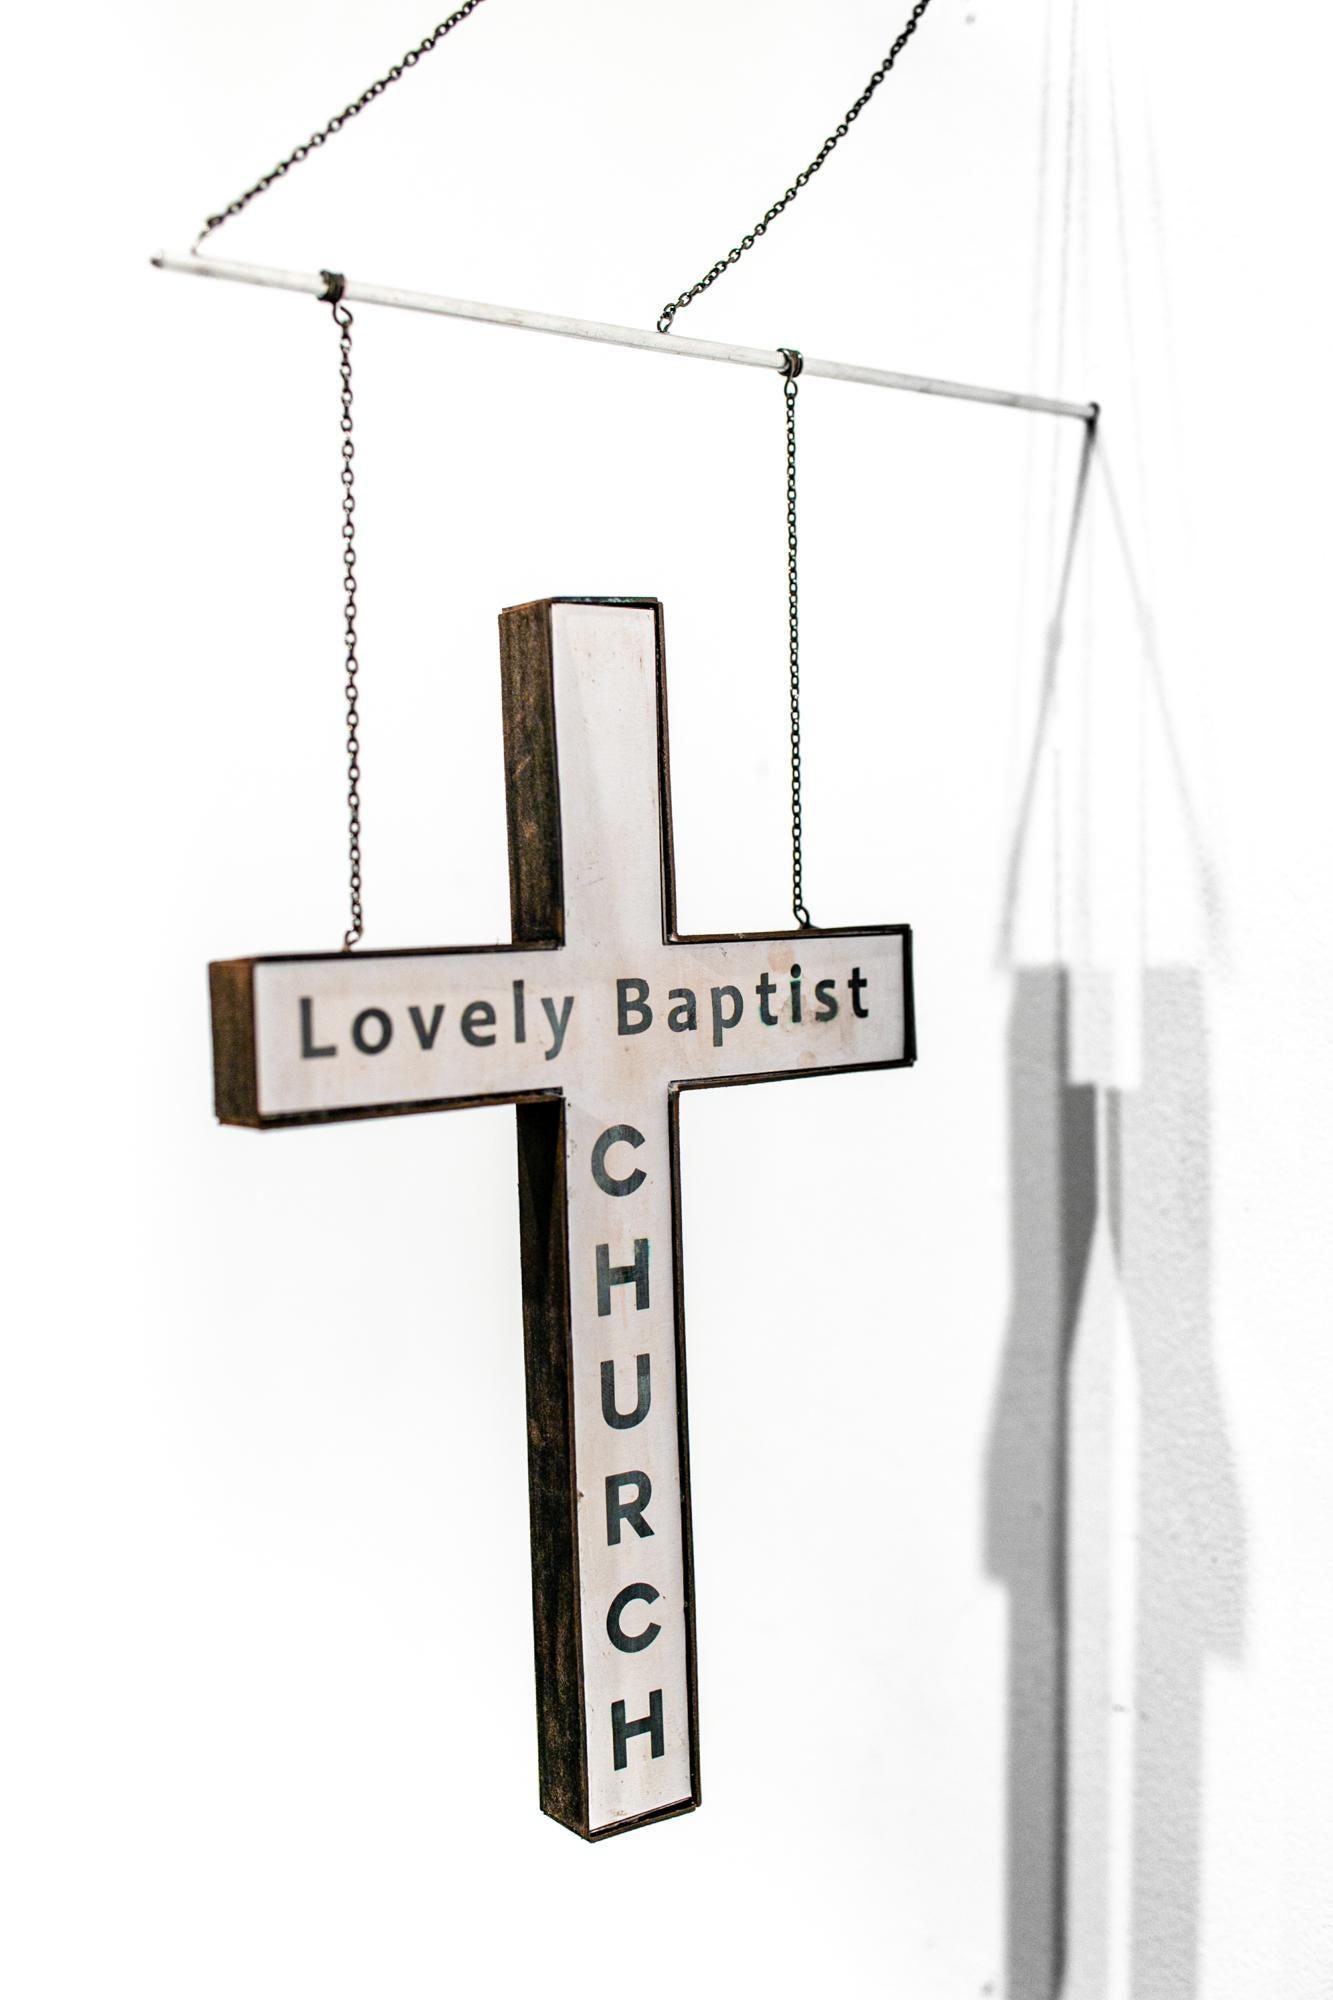 Lovely Baptist Church